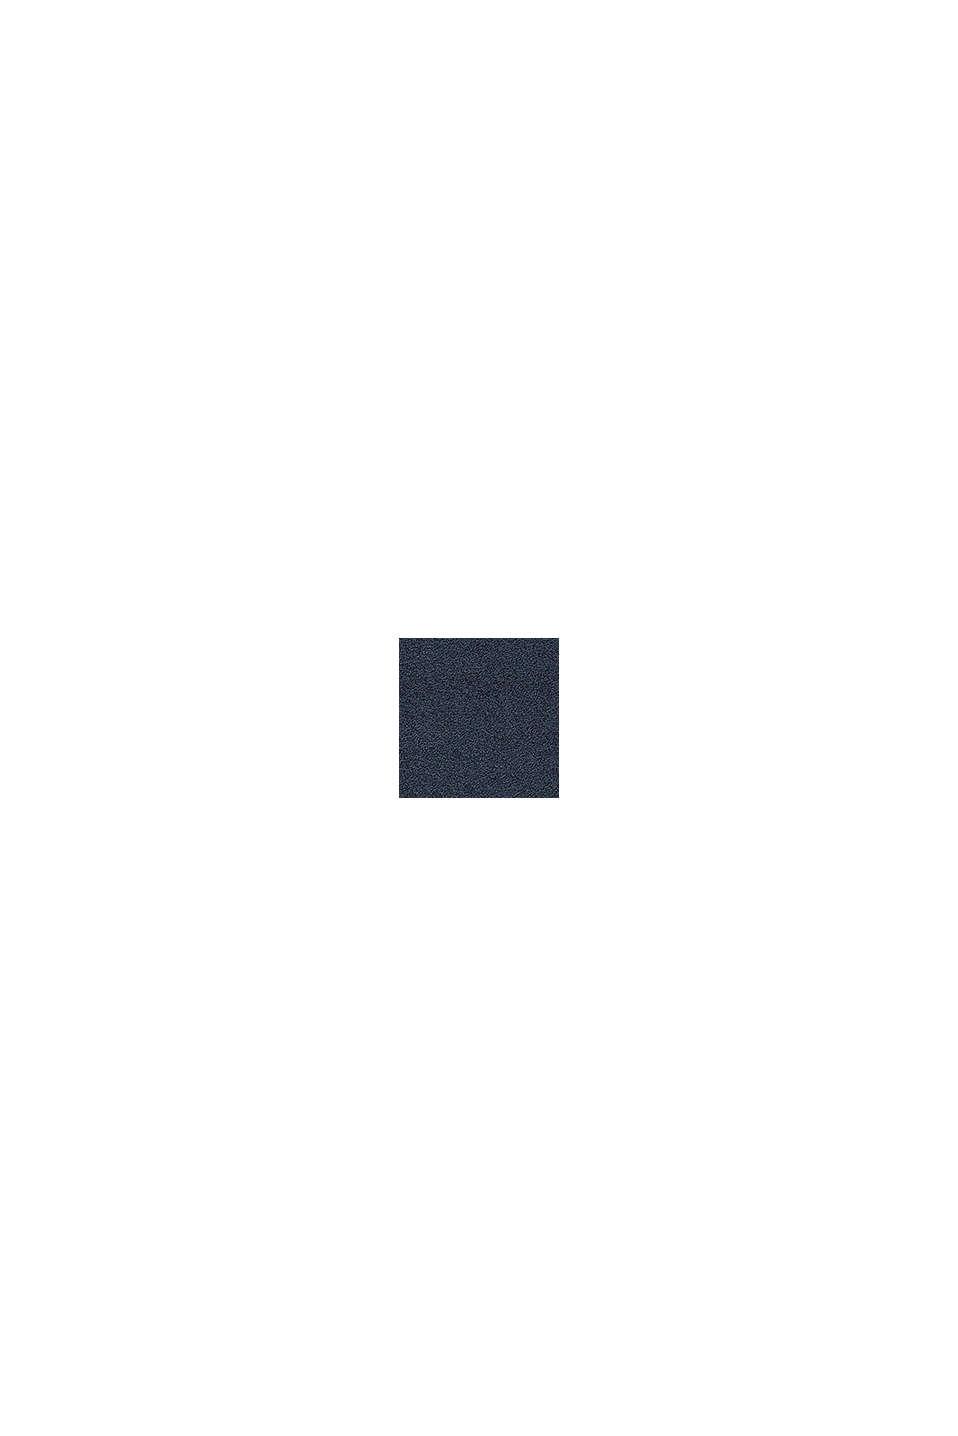 Terrycloth bath mat made of 100% cotton, NAVY BLUE, swatch